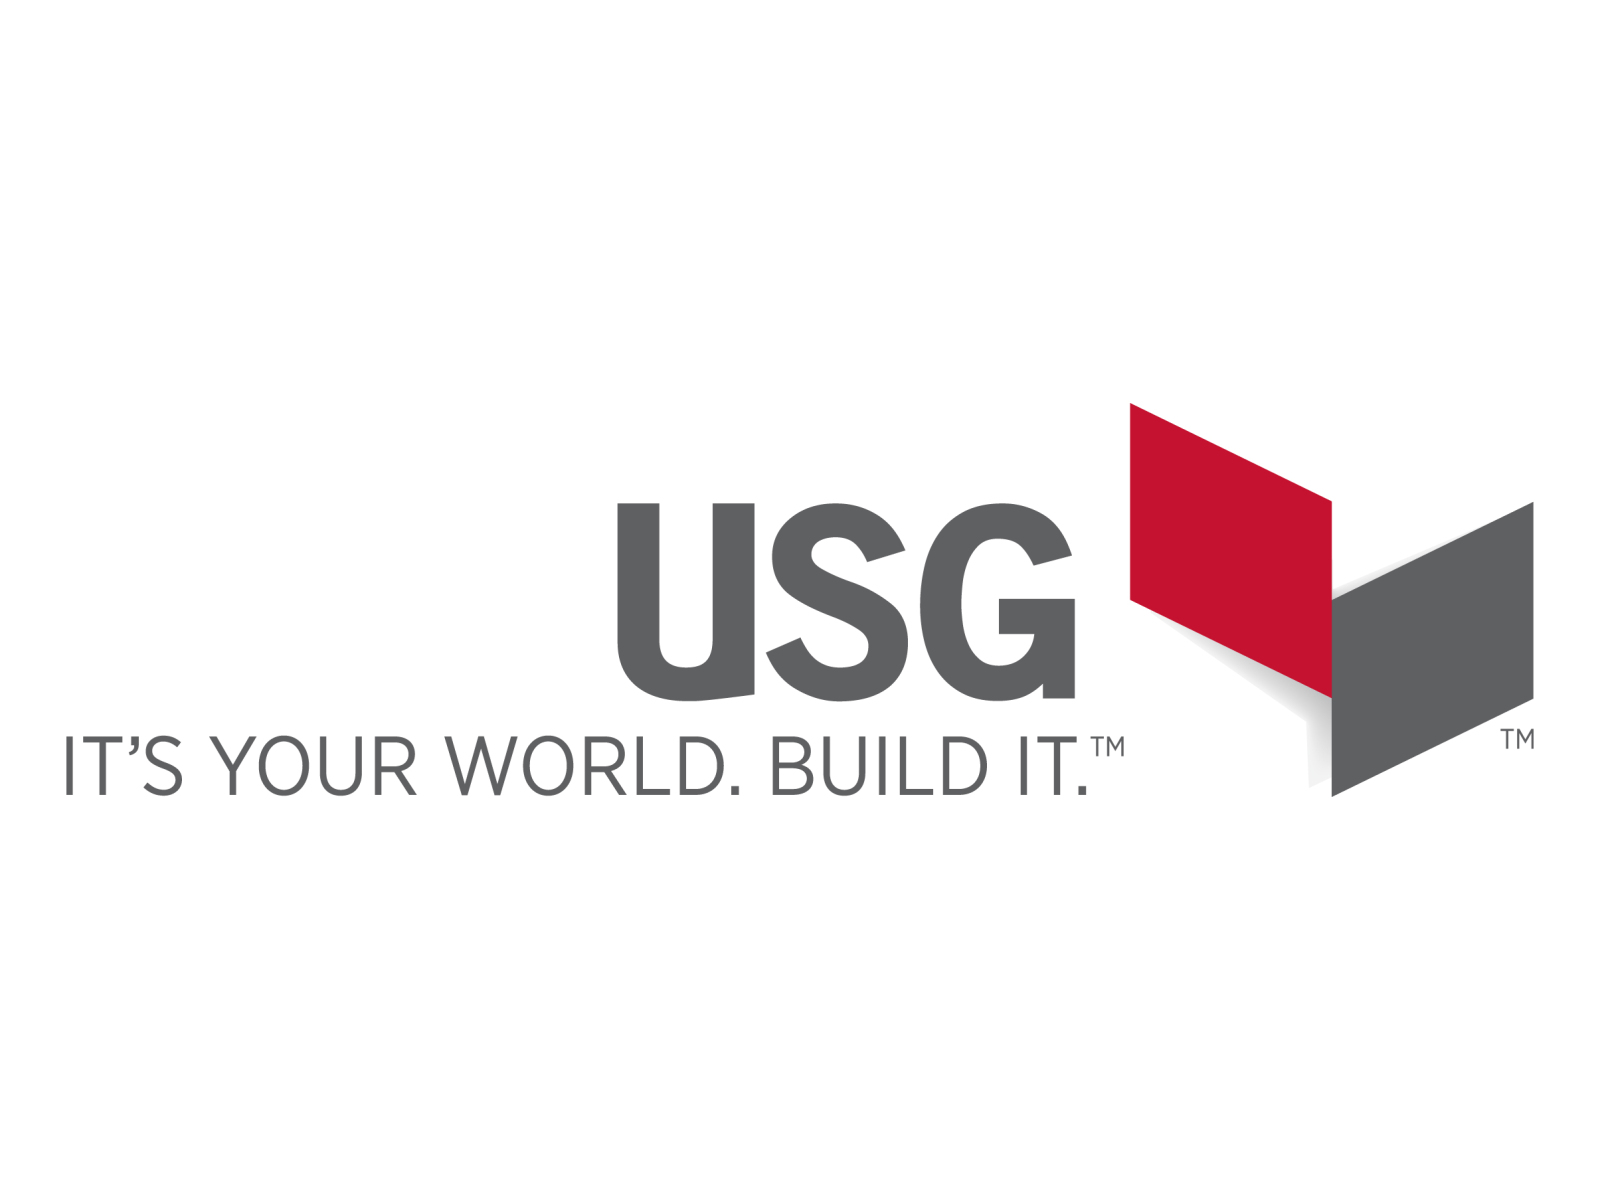 usg new logo 2 美国著名建材制造商USG公司启用新Logo